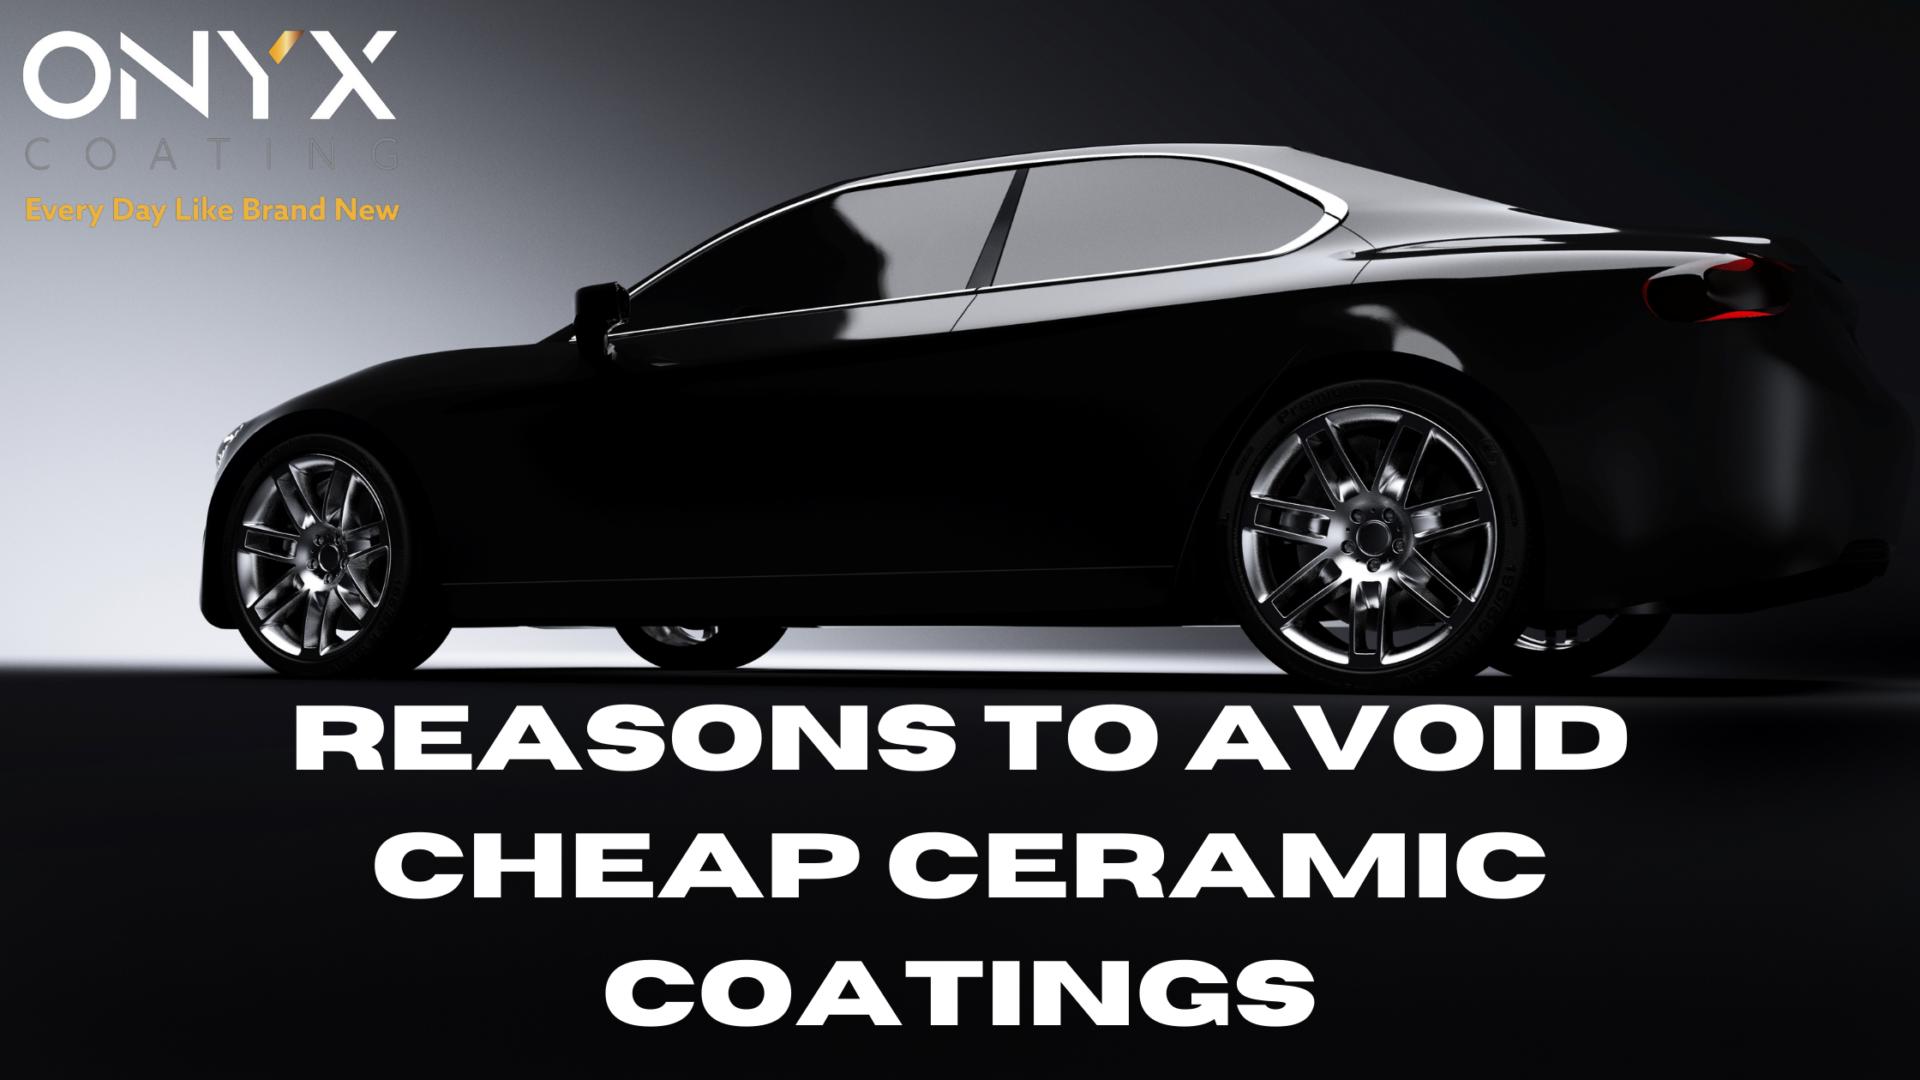 Reasons why to avoid cheap Ceramic Coatings